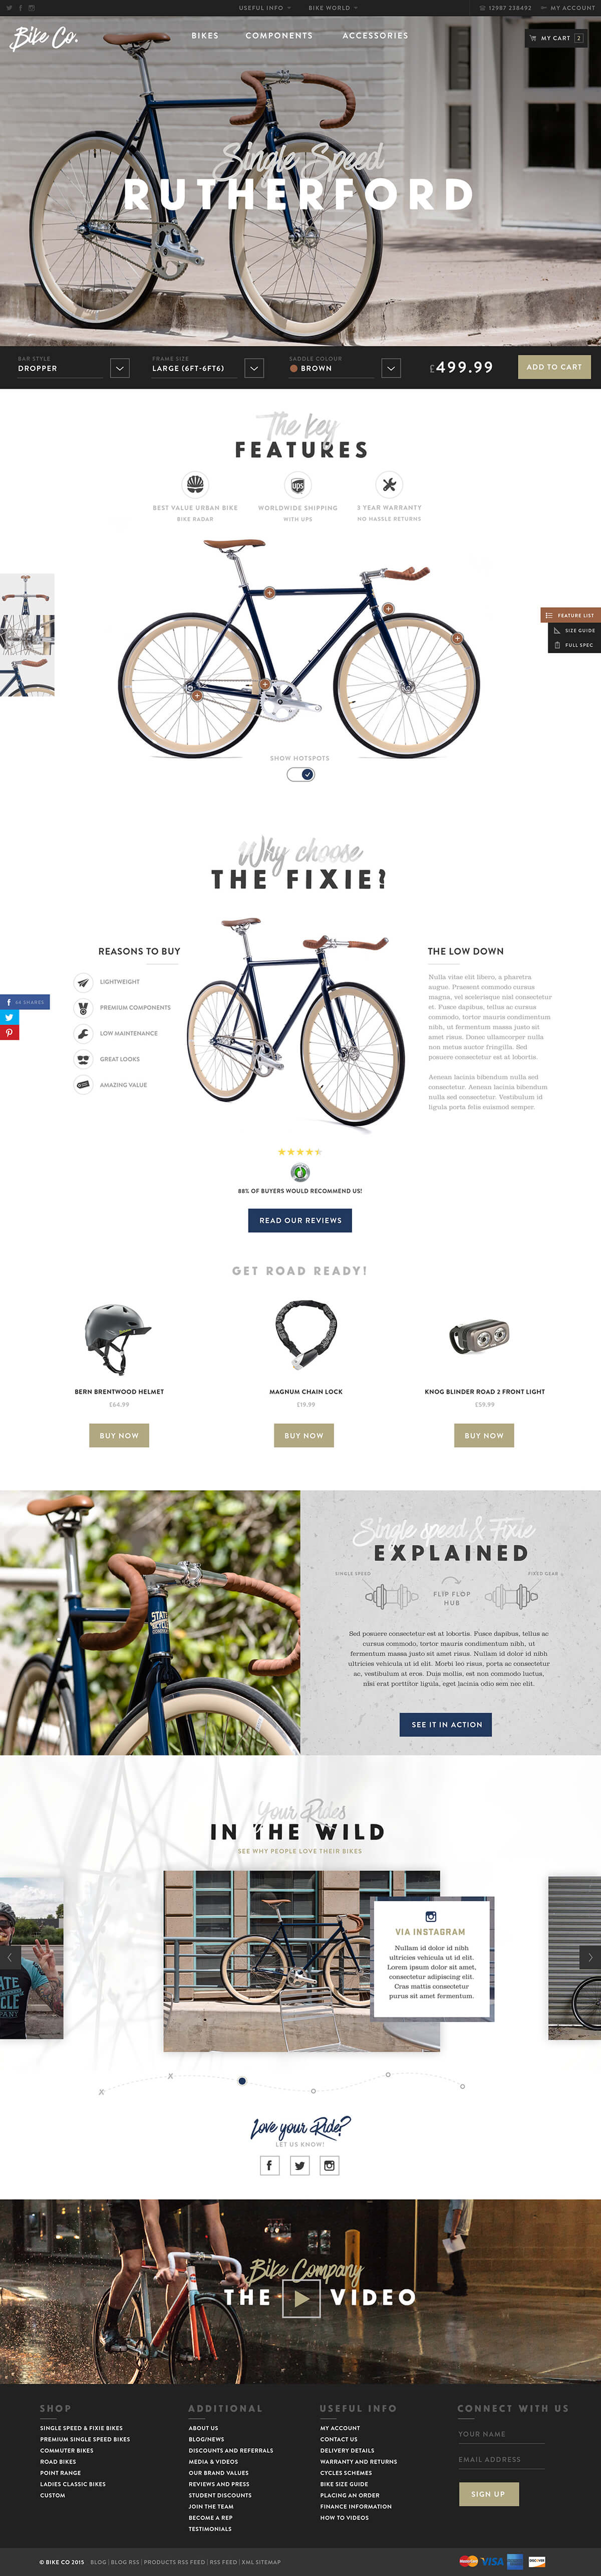 Bike co - behance